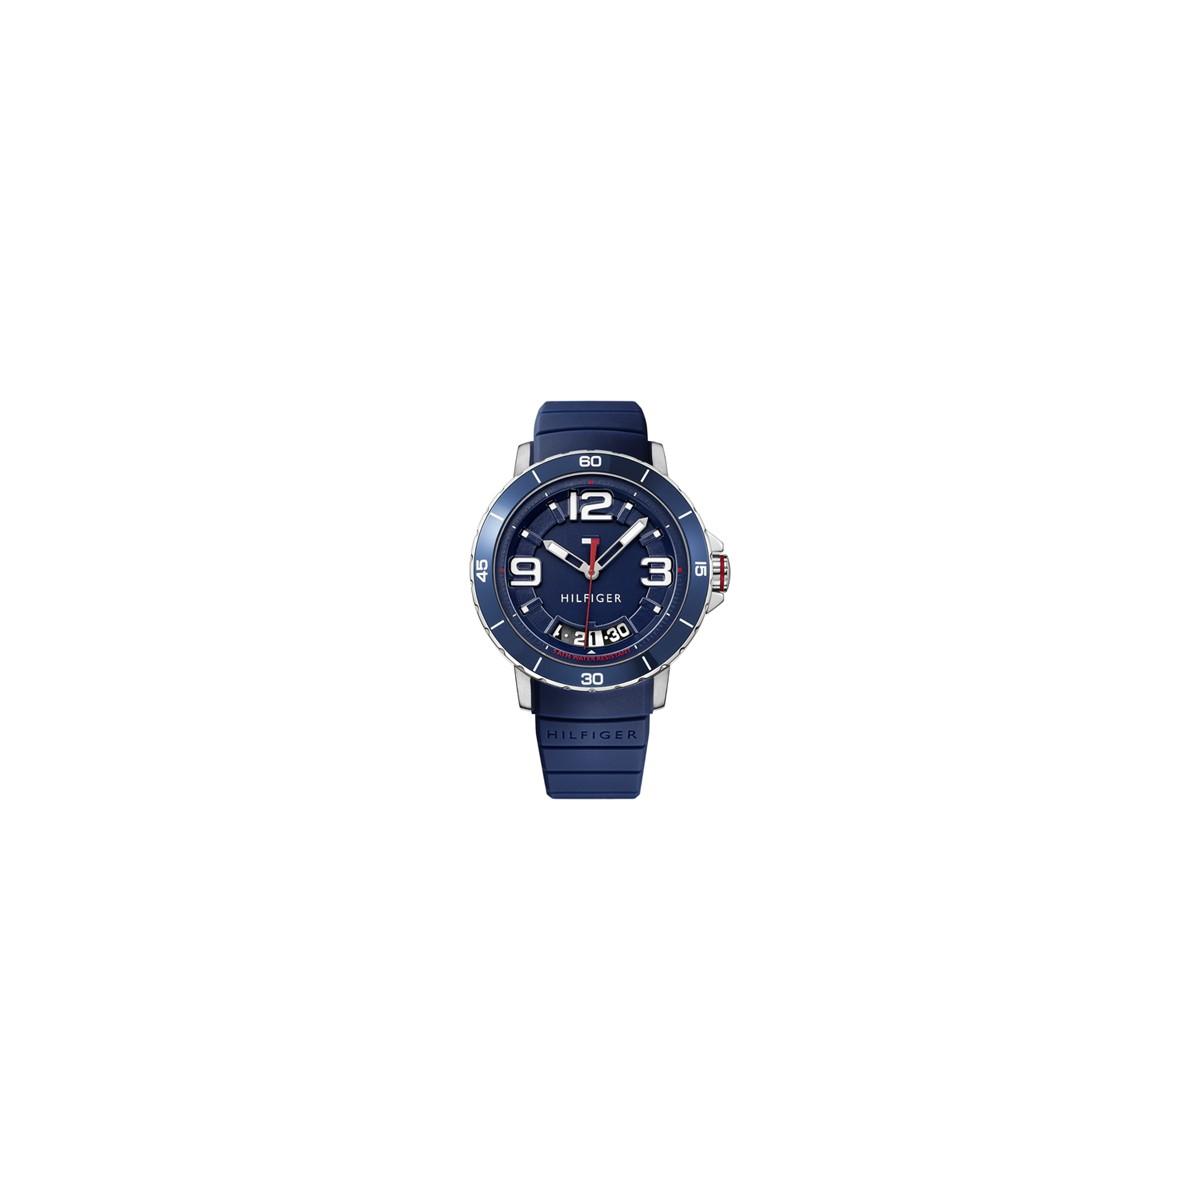 https://www.gaberjoyeria.com/3245-thickbox_default/reloj-tommy-hilfiger-1791250.jpg